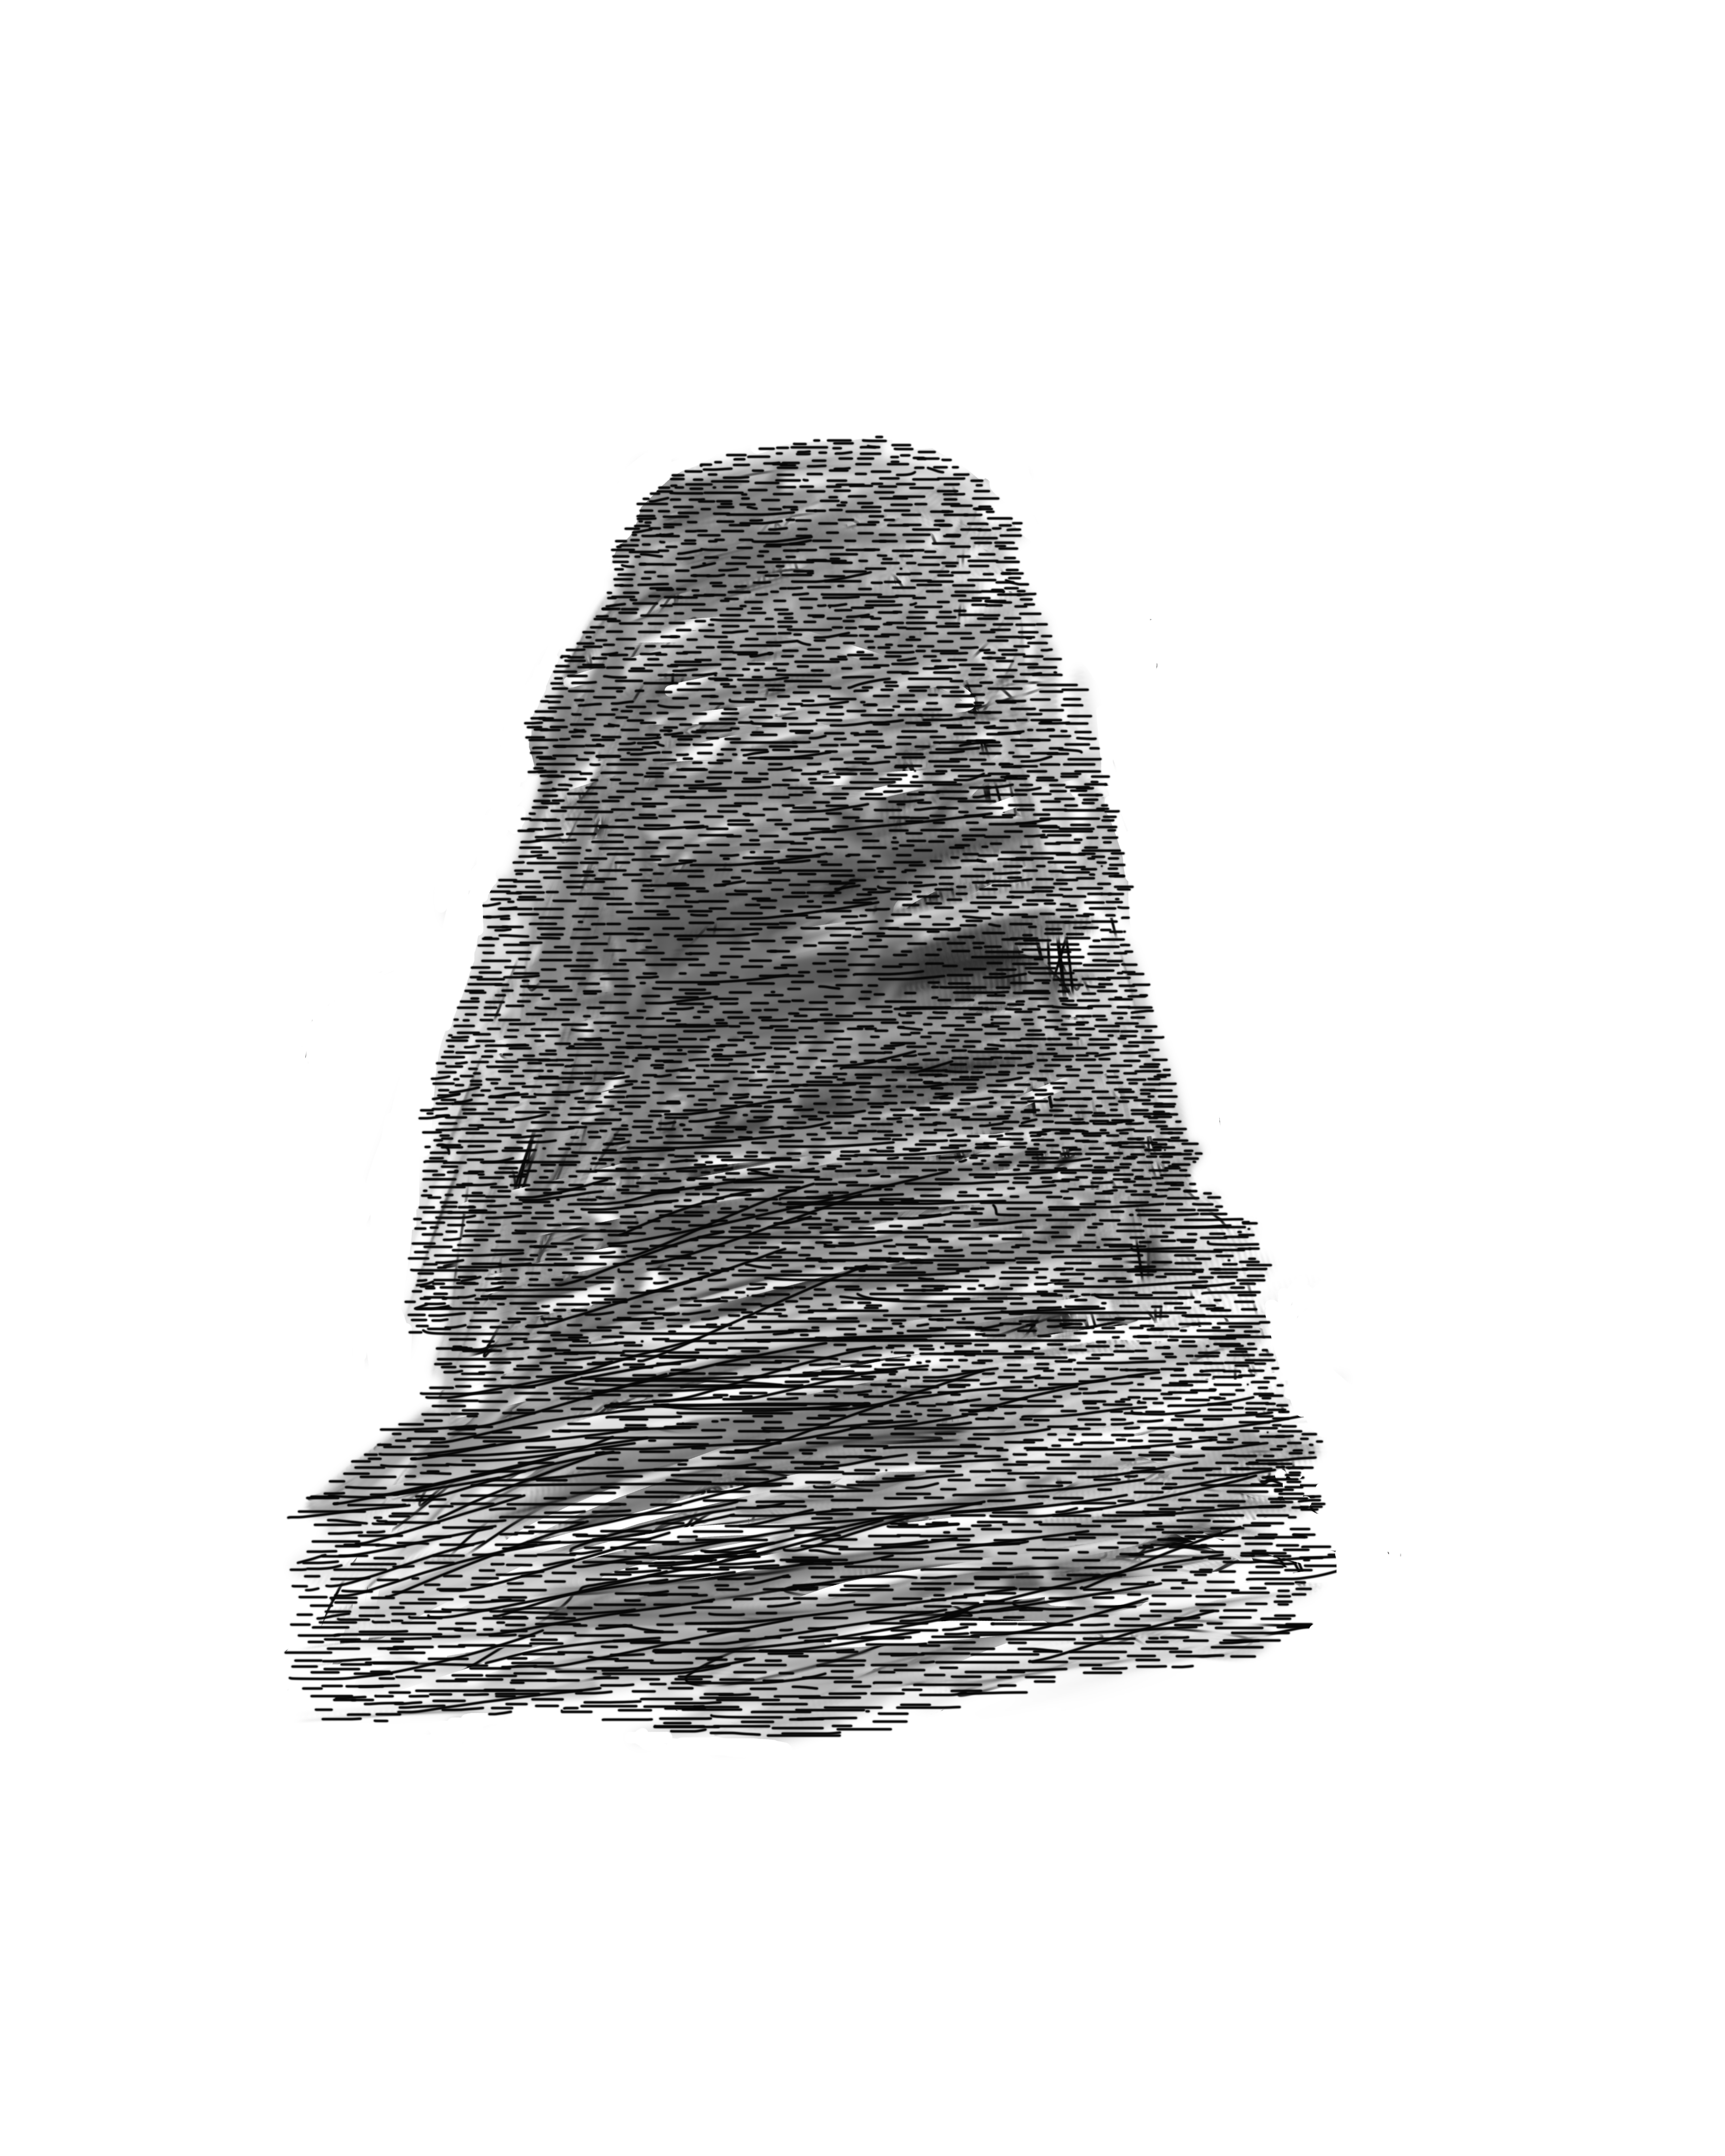 mountainsoftrees_digital